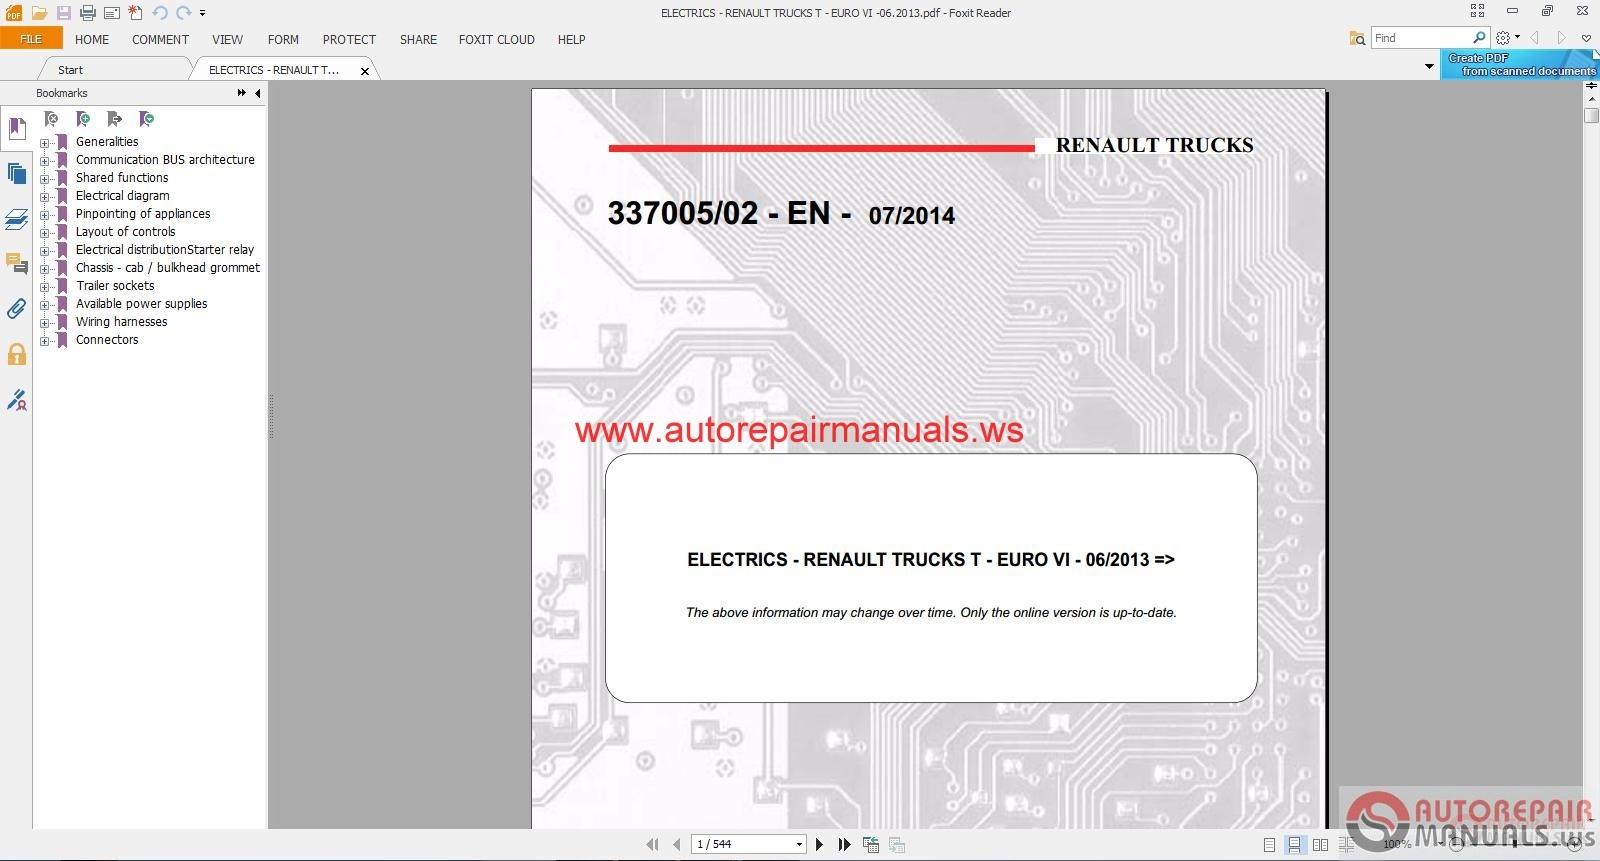 Electrics - Renault Trucks T - Euro Vi